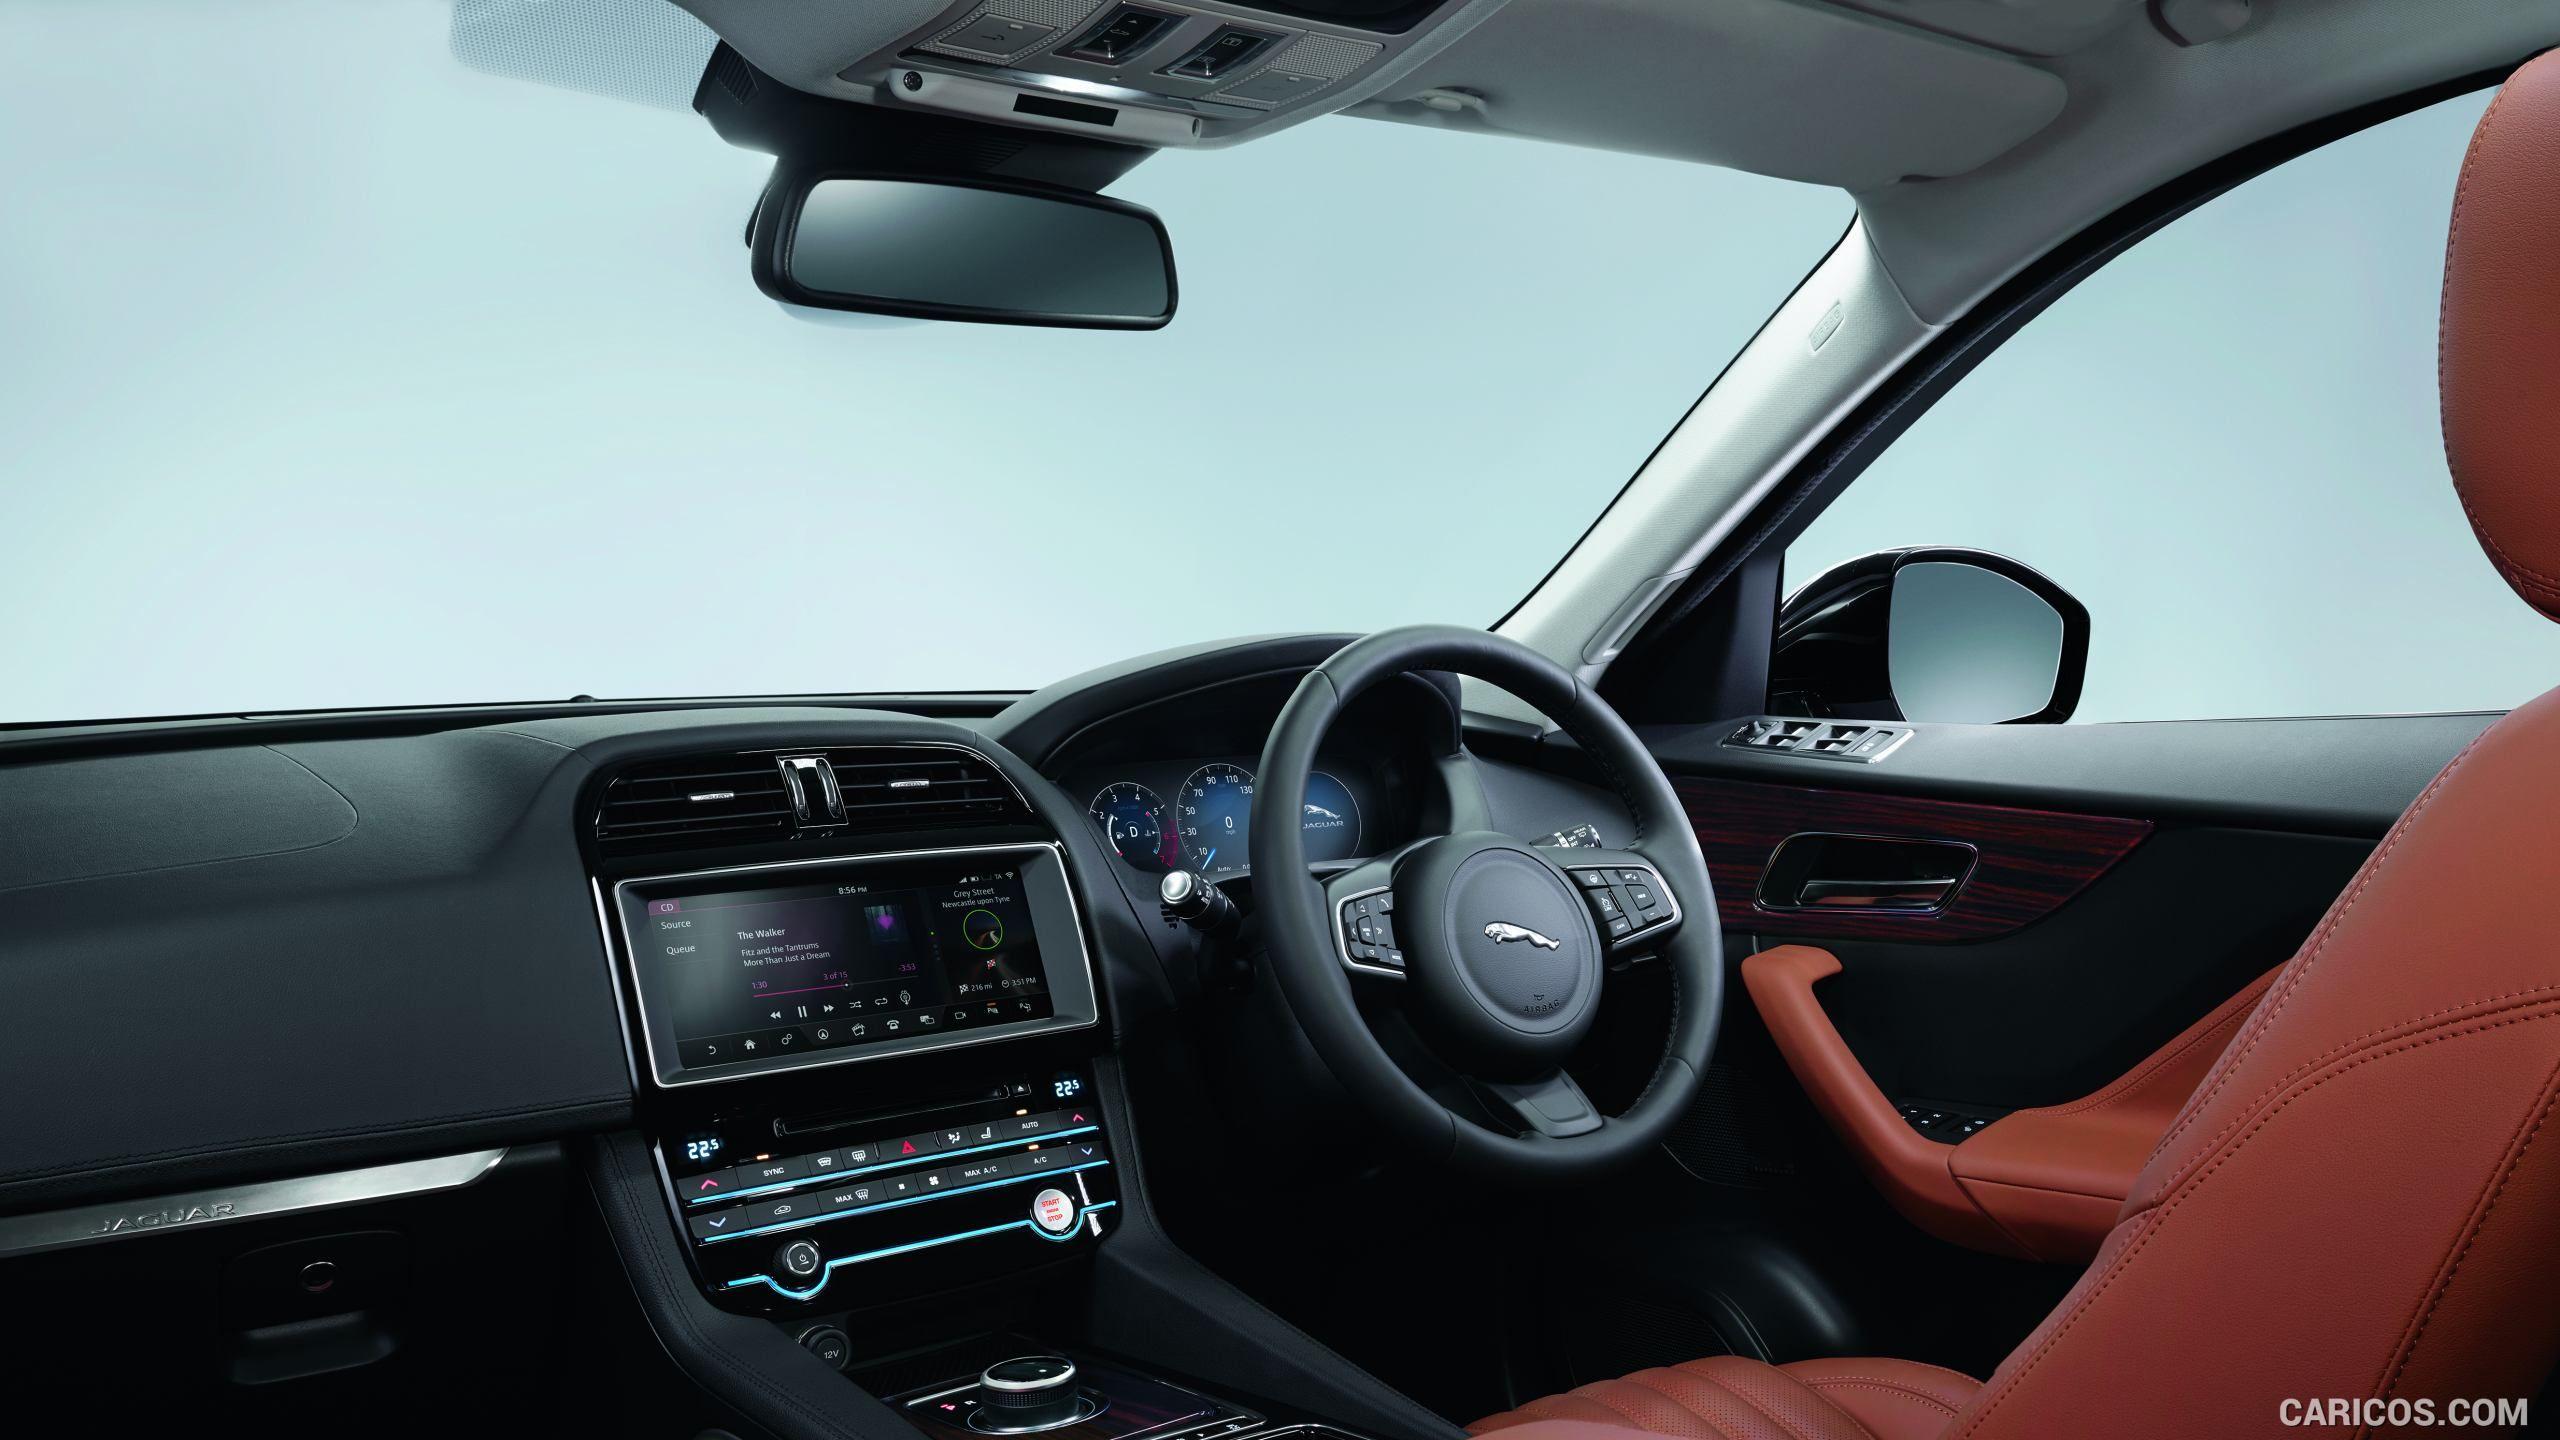 pace jaguar auto f autoguide news manual show price spy interior gearbox photos photo